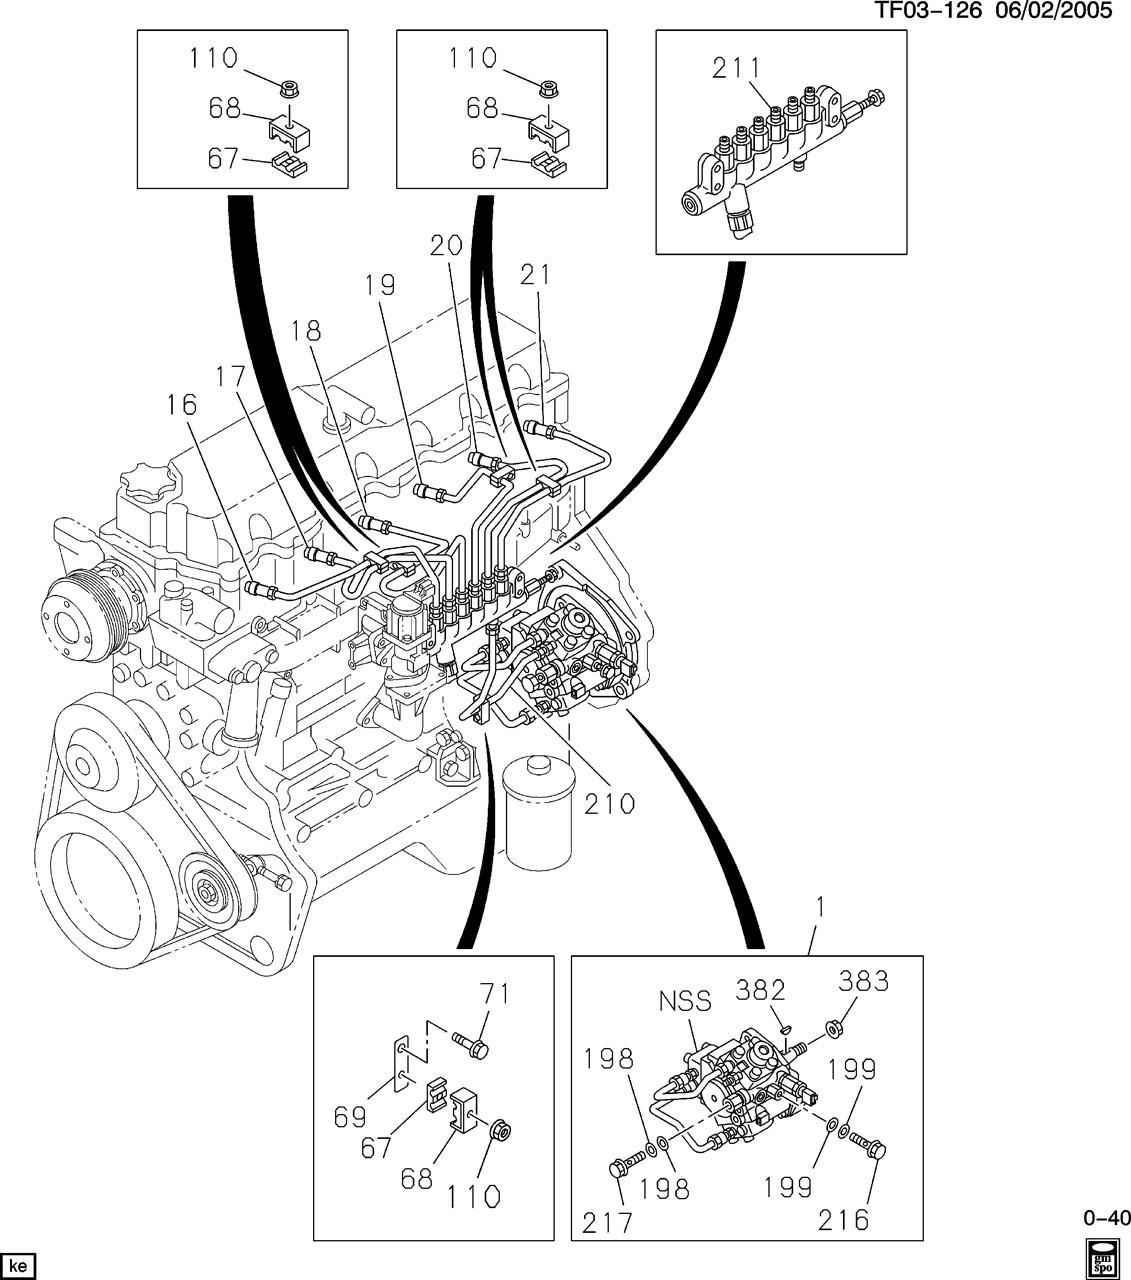 [WLLP_2054]   HB_0532] Farmtrac Tractor Alternator Wiring Diagram Schematic Wiring   Farmtrac Tractor Alternator Wiring Diagram      Phil Cran Trofu Pead Phae Mohammedshrine Librar Wiring 101